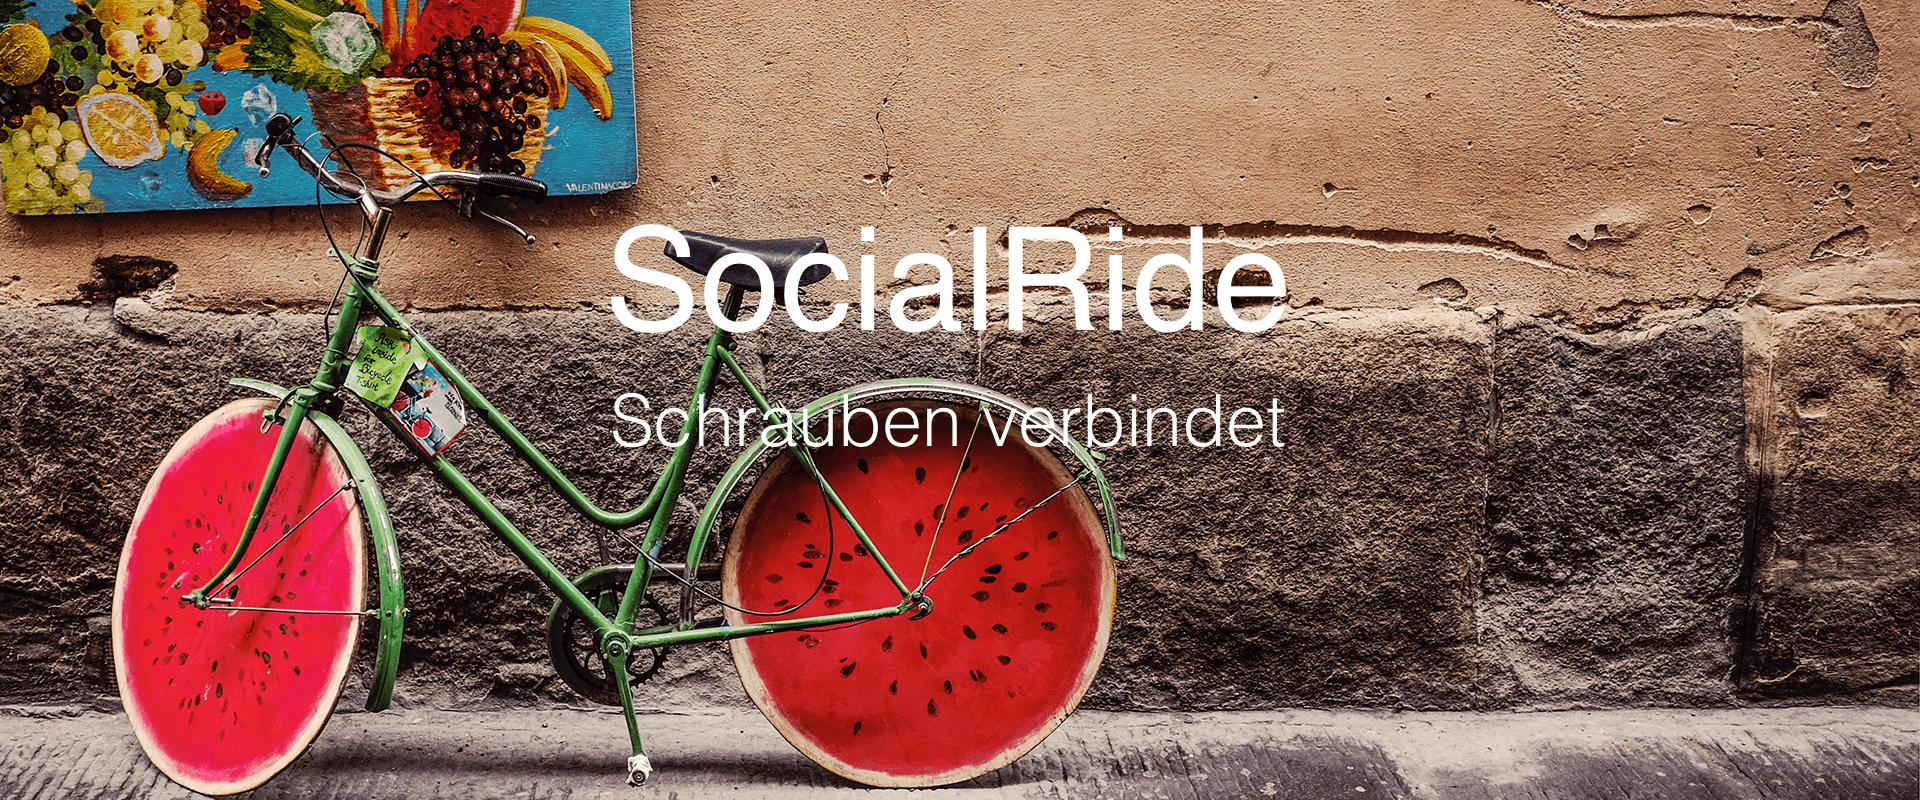 Social Ride, die soziale Fahrradwerkstatt